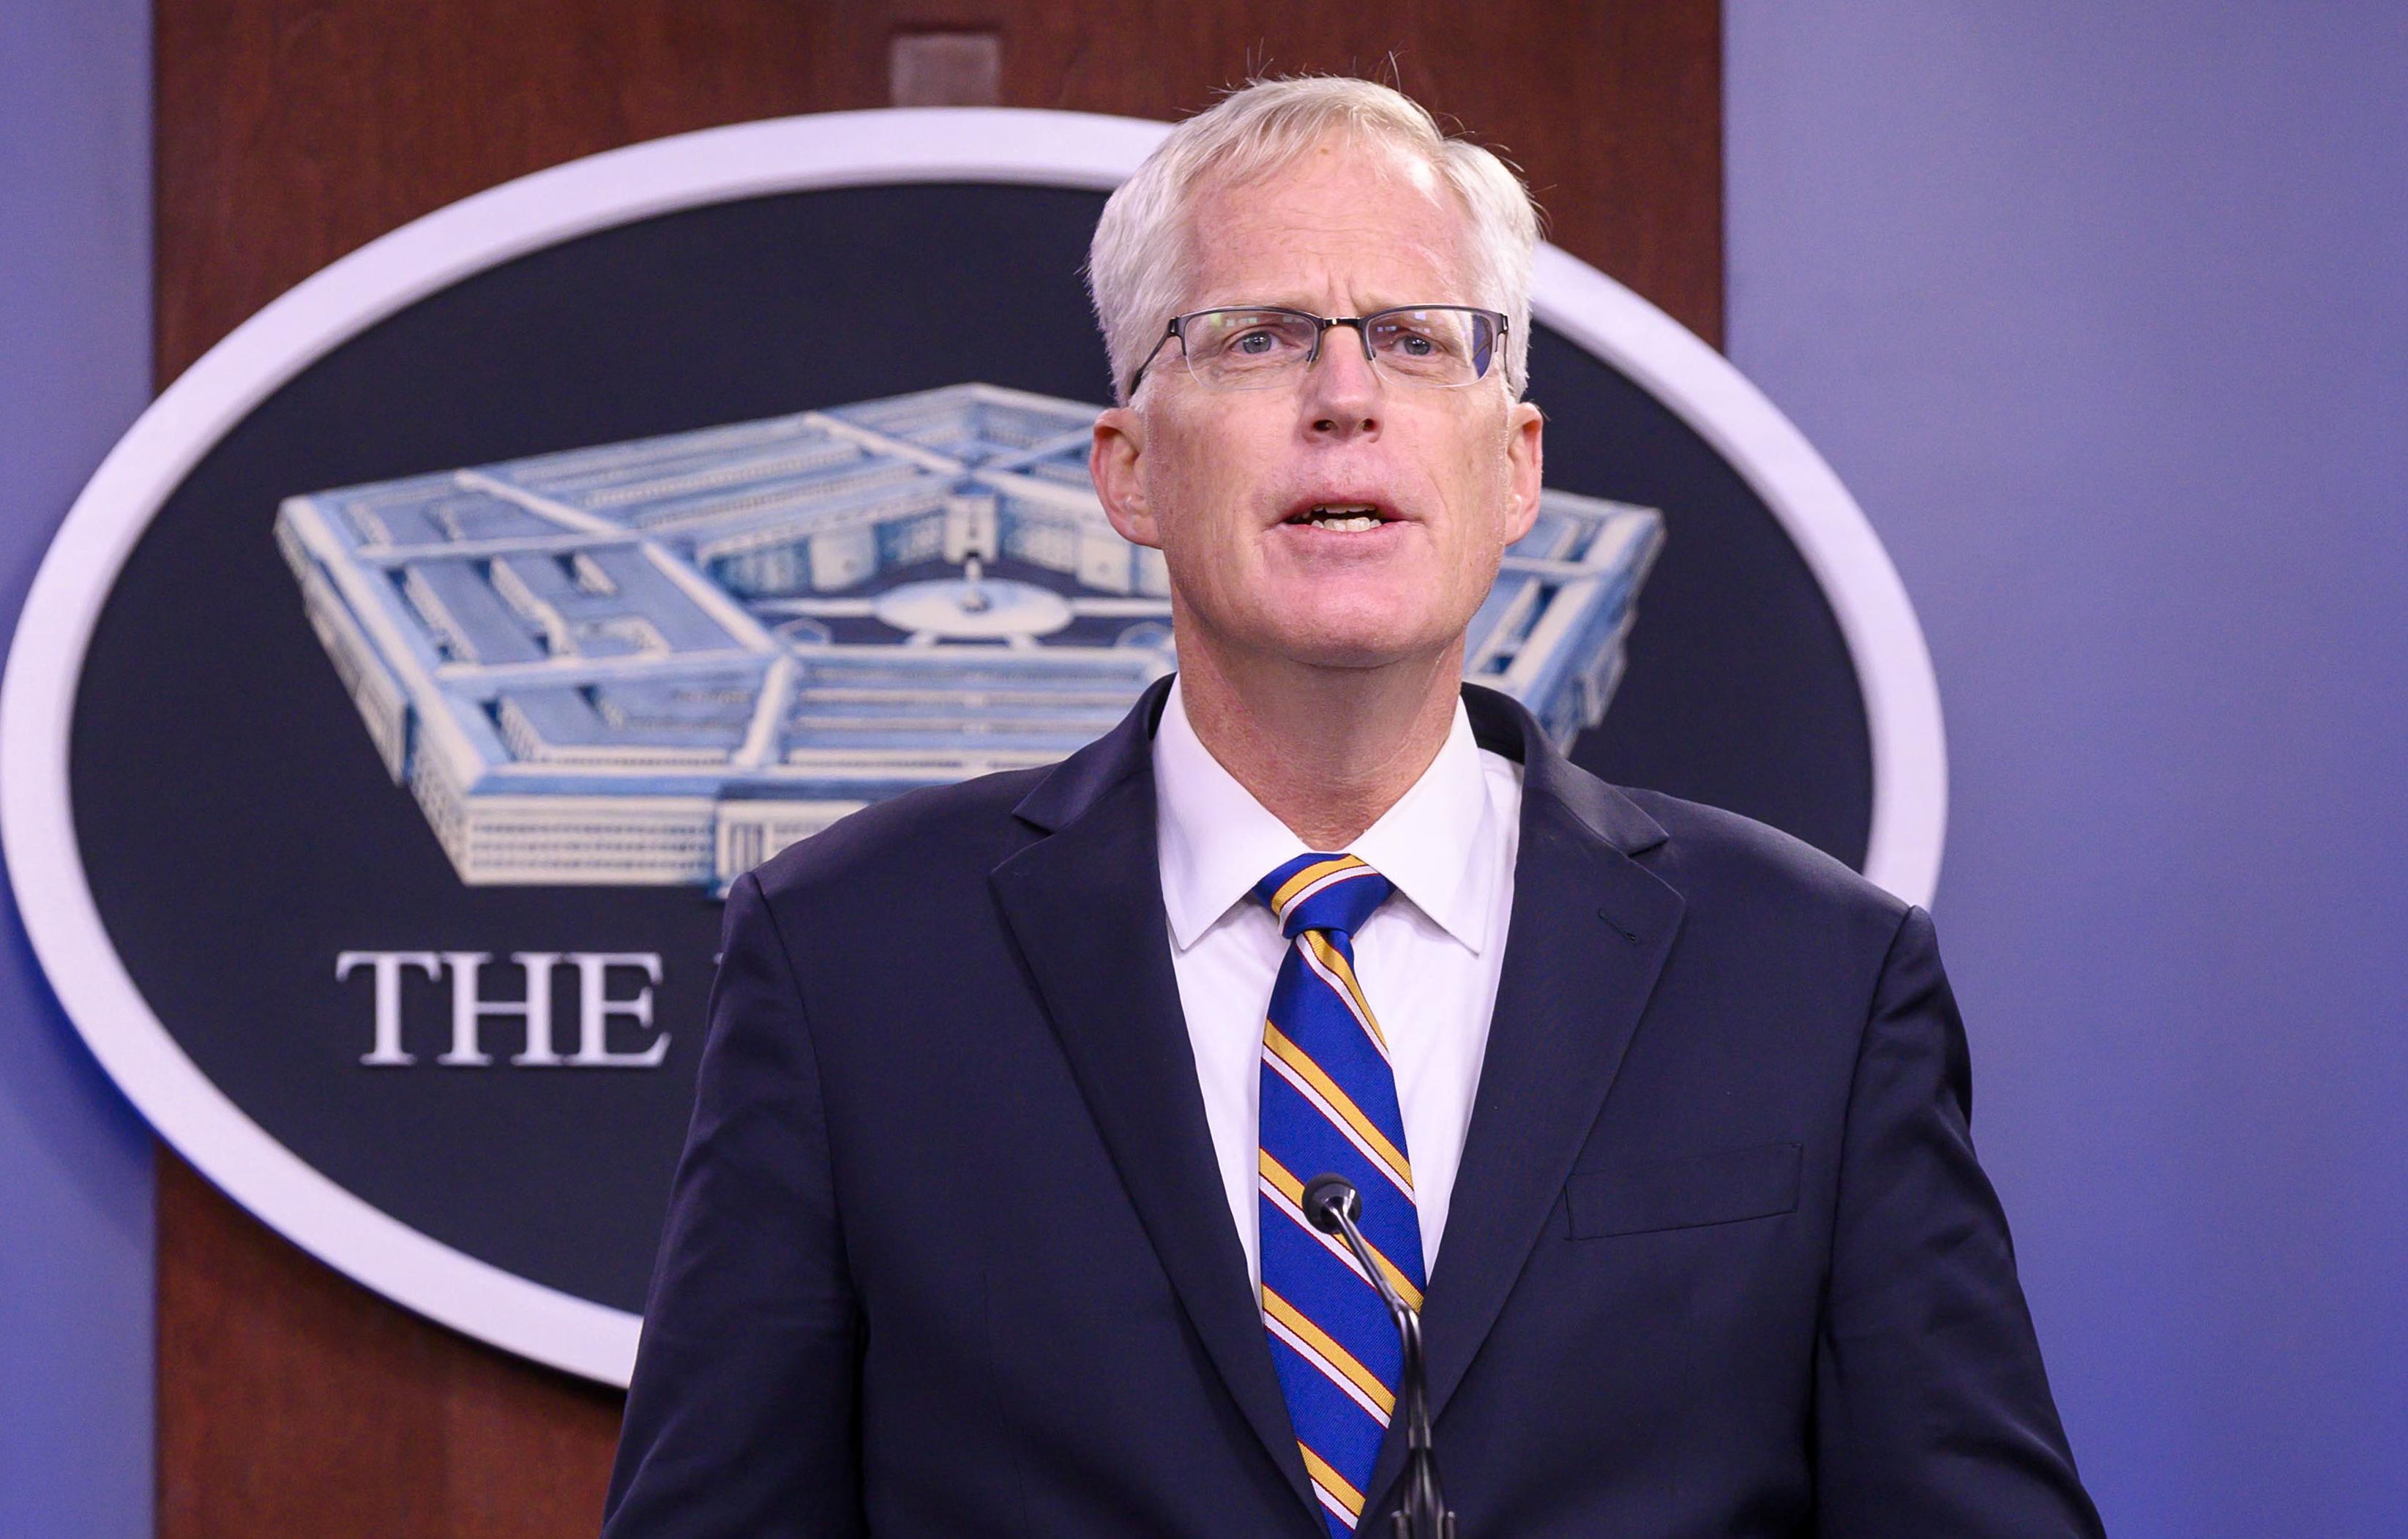 Acting Defense Secretary Christopher Miller addresses media at the Pentagon, Washington